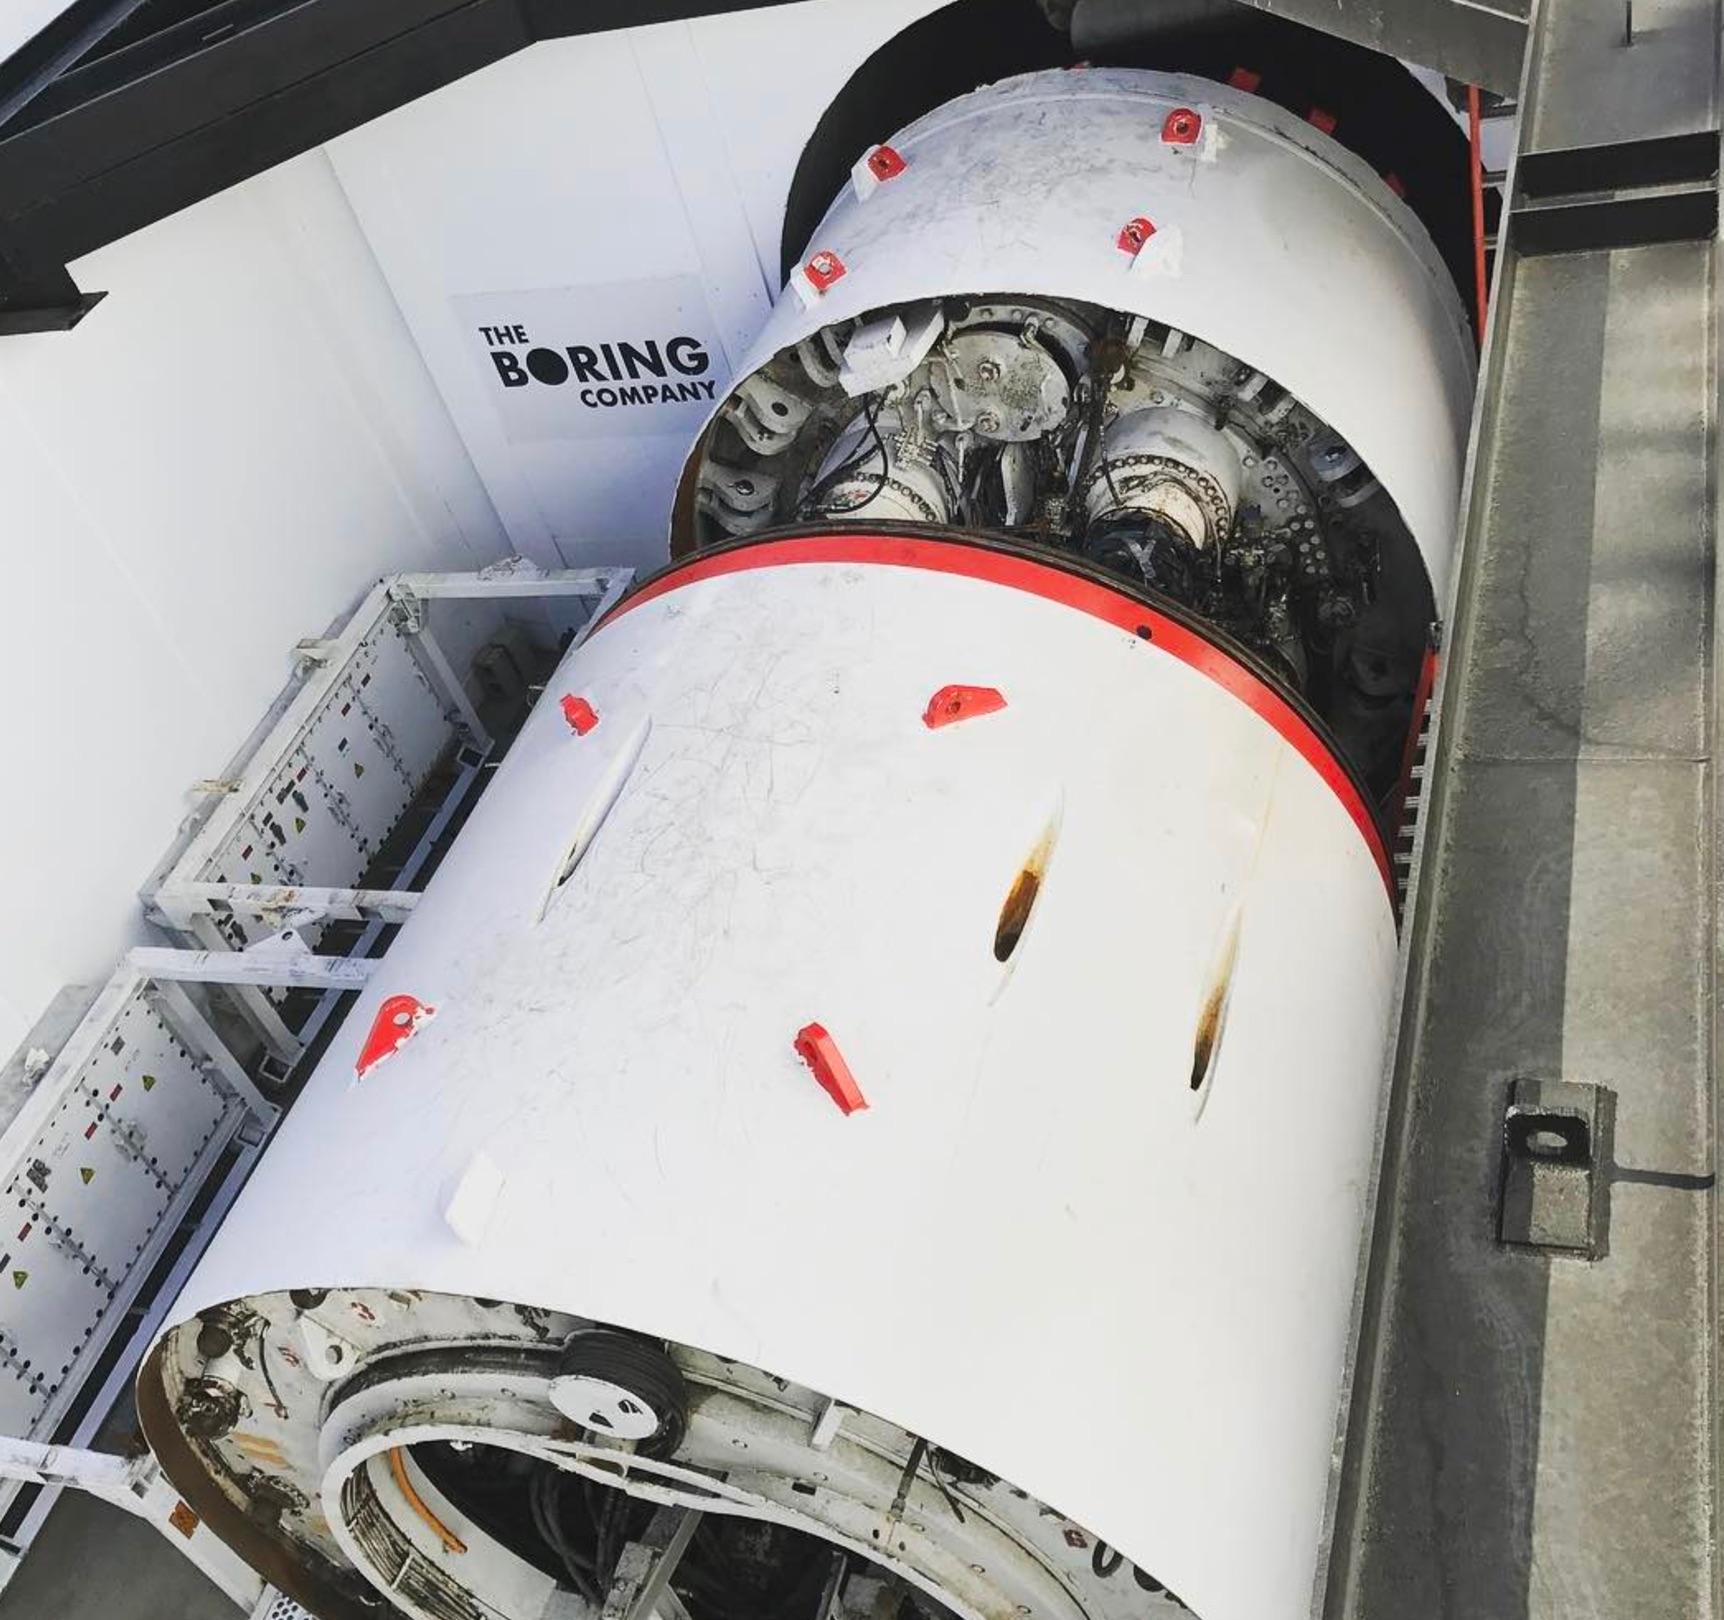 elon-musk-boring-company-tunnel-machine-godot